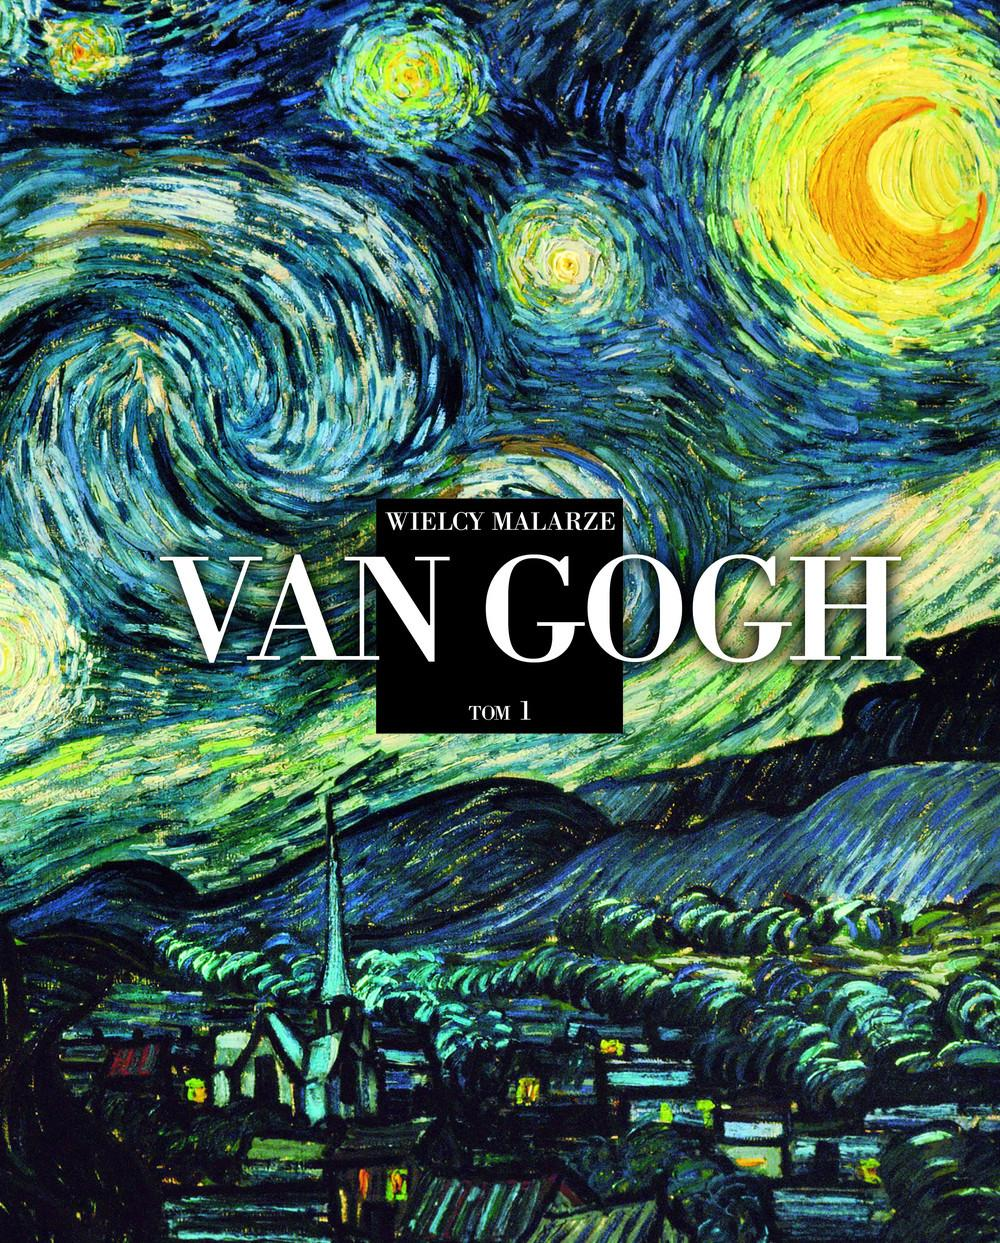 Van Gogh. Kolekcja Wielcy Malarze - Edipresse Polska